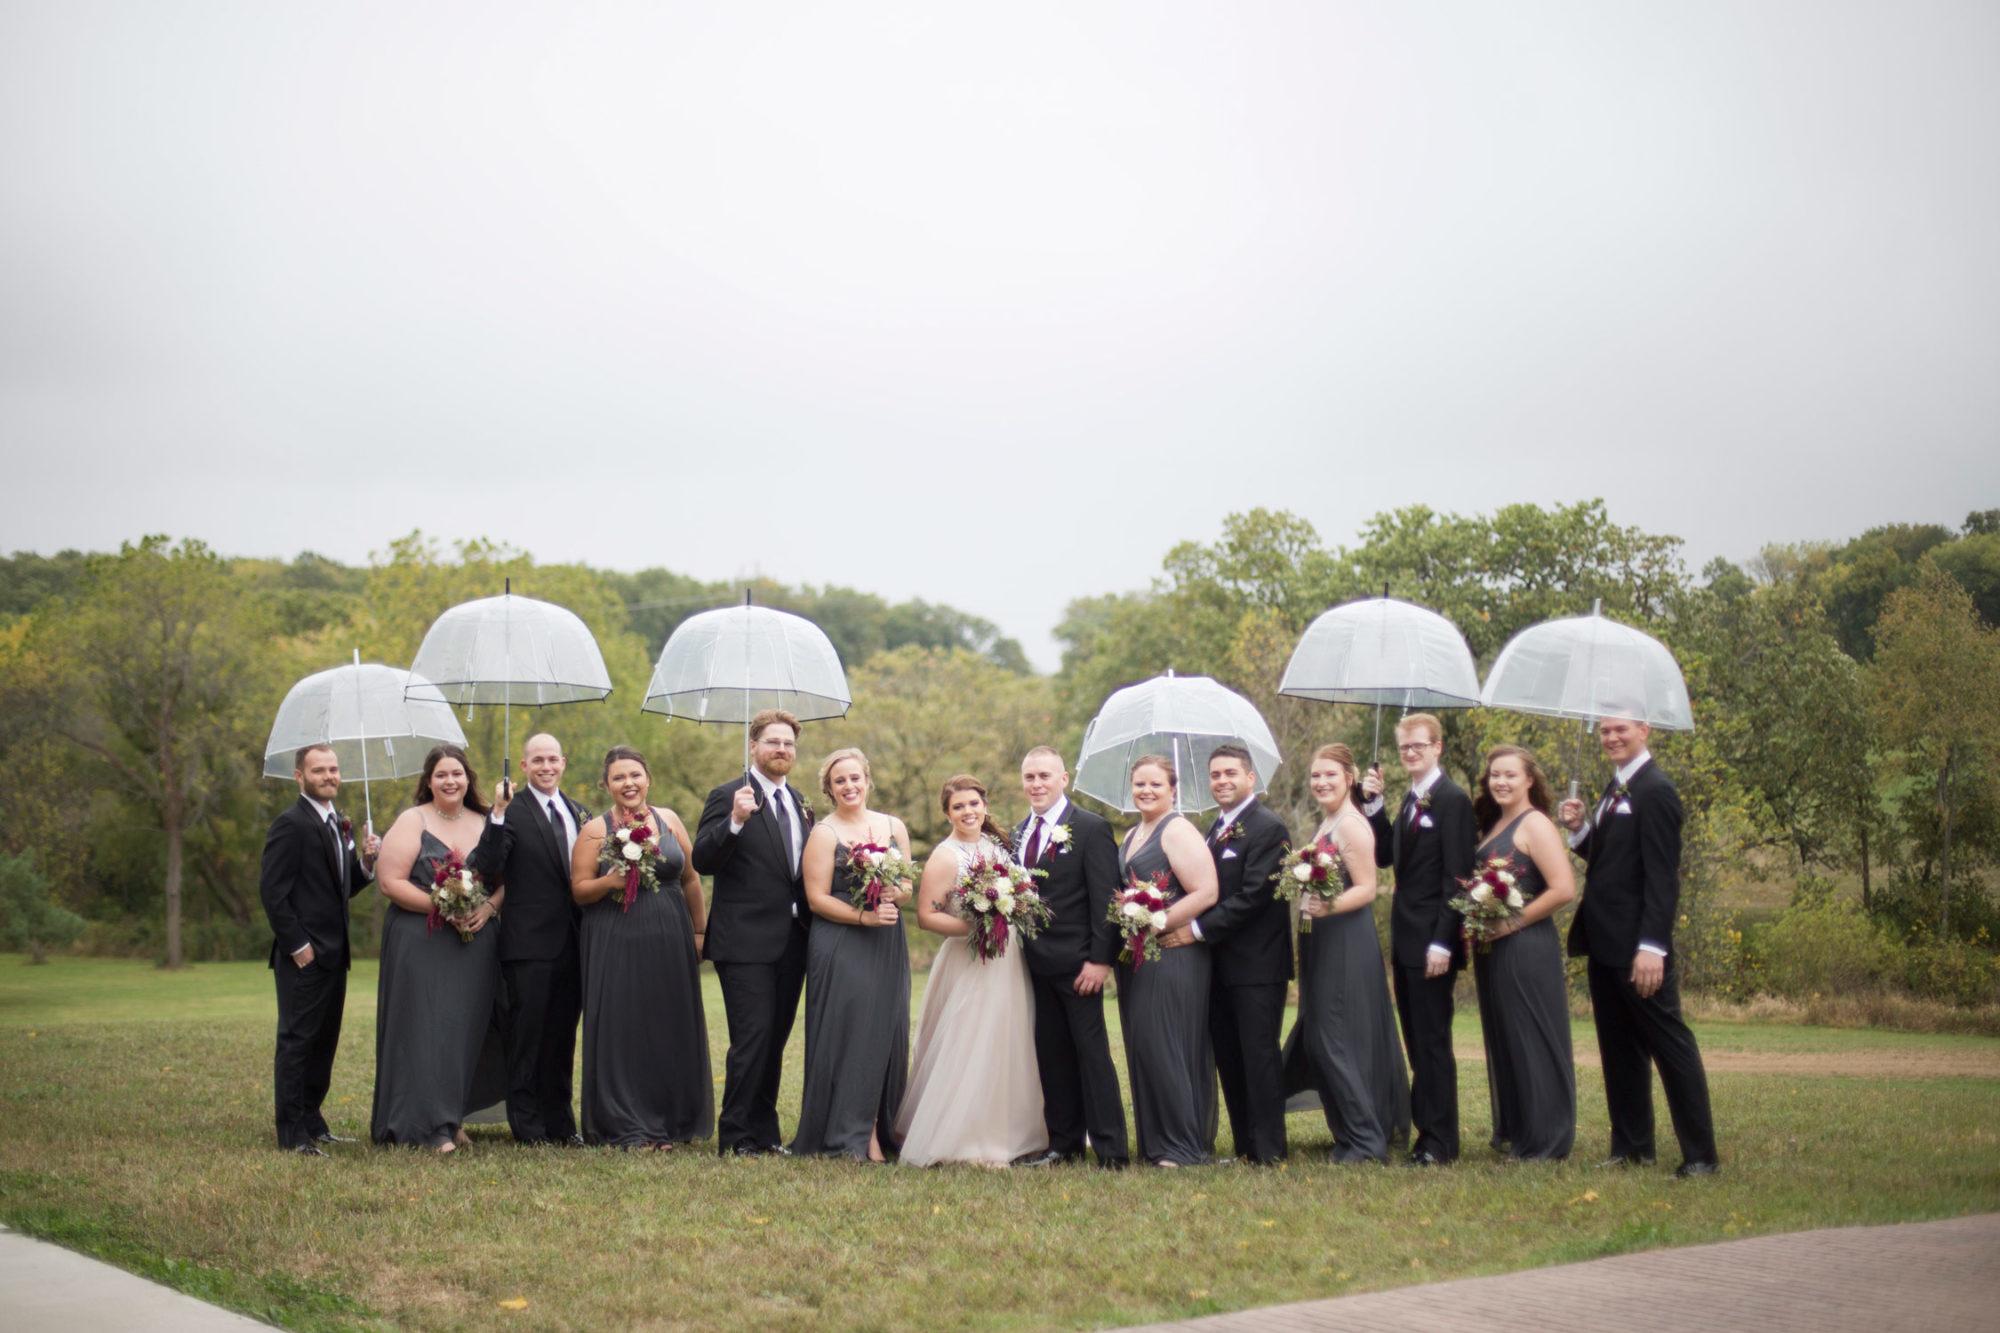 Iowa City wedding photographer, Cedar Rapids wedding photographer, Rapid Creek Cidery weddings, Iowa City area wedding photographer, Eastern Iowa wedding photographer, wedding photographers Cedar Rapids